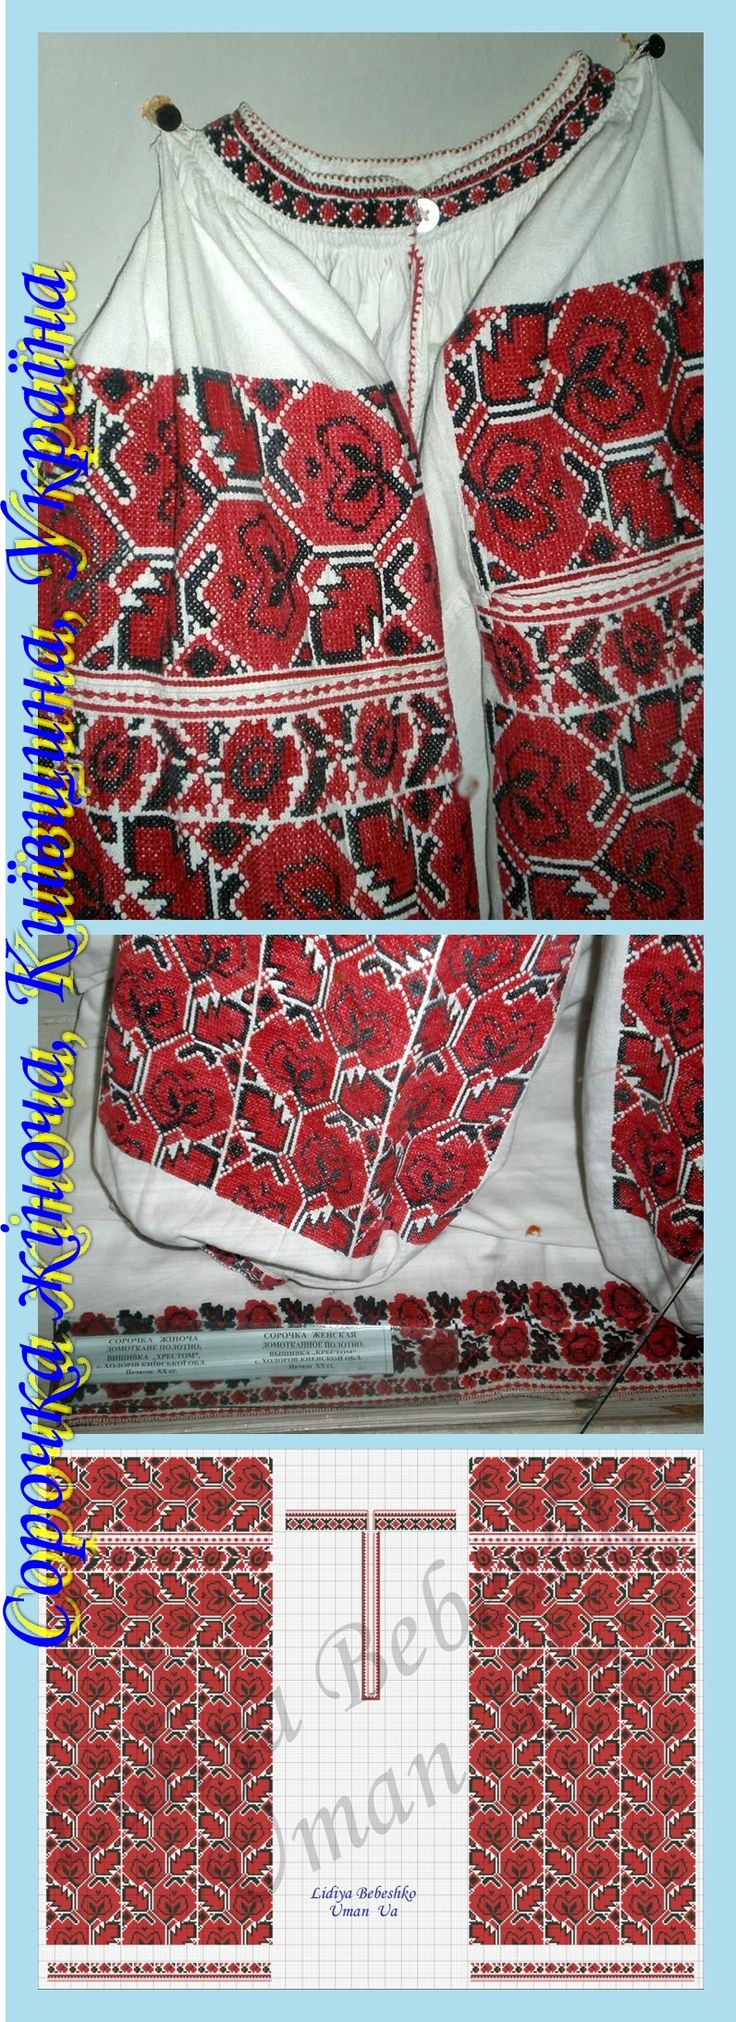 Polish Embroidery Folk Embroidery Cross Stitch Embroidery